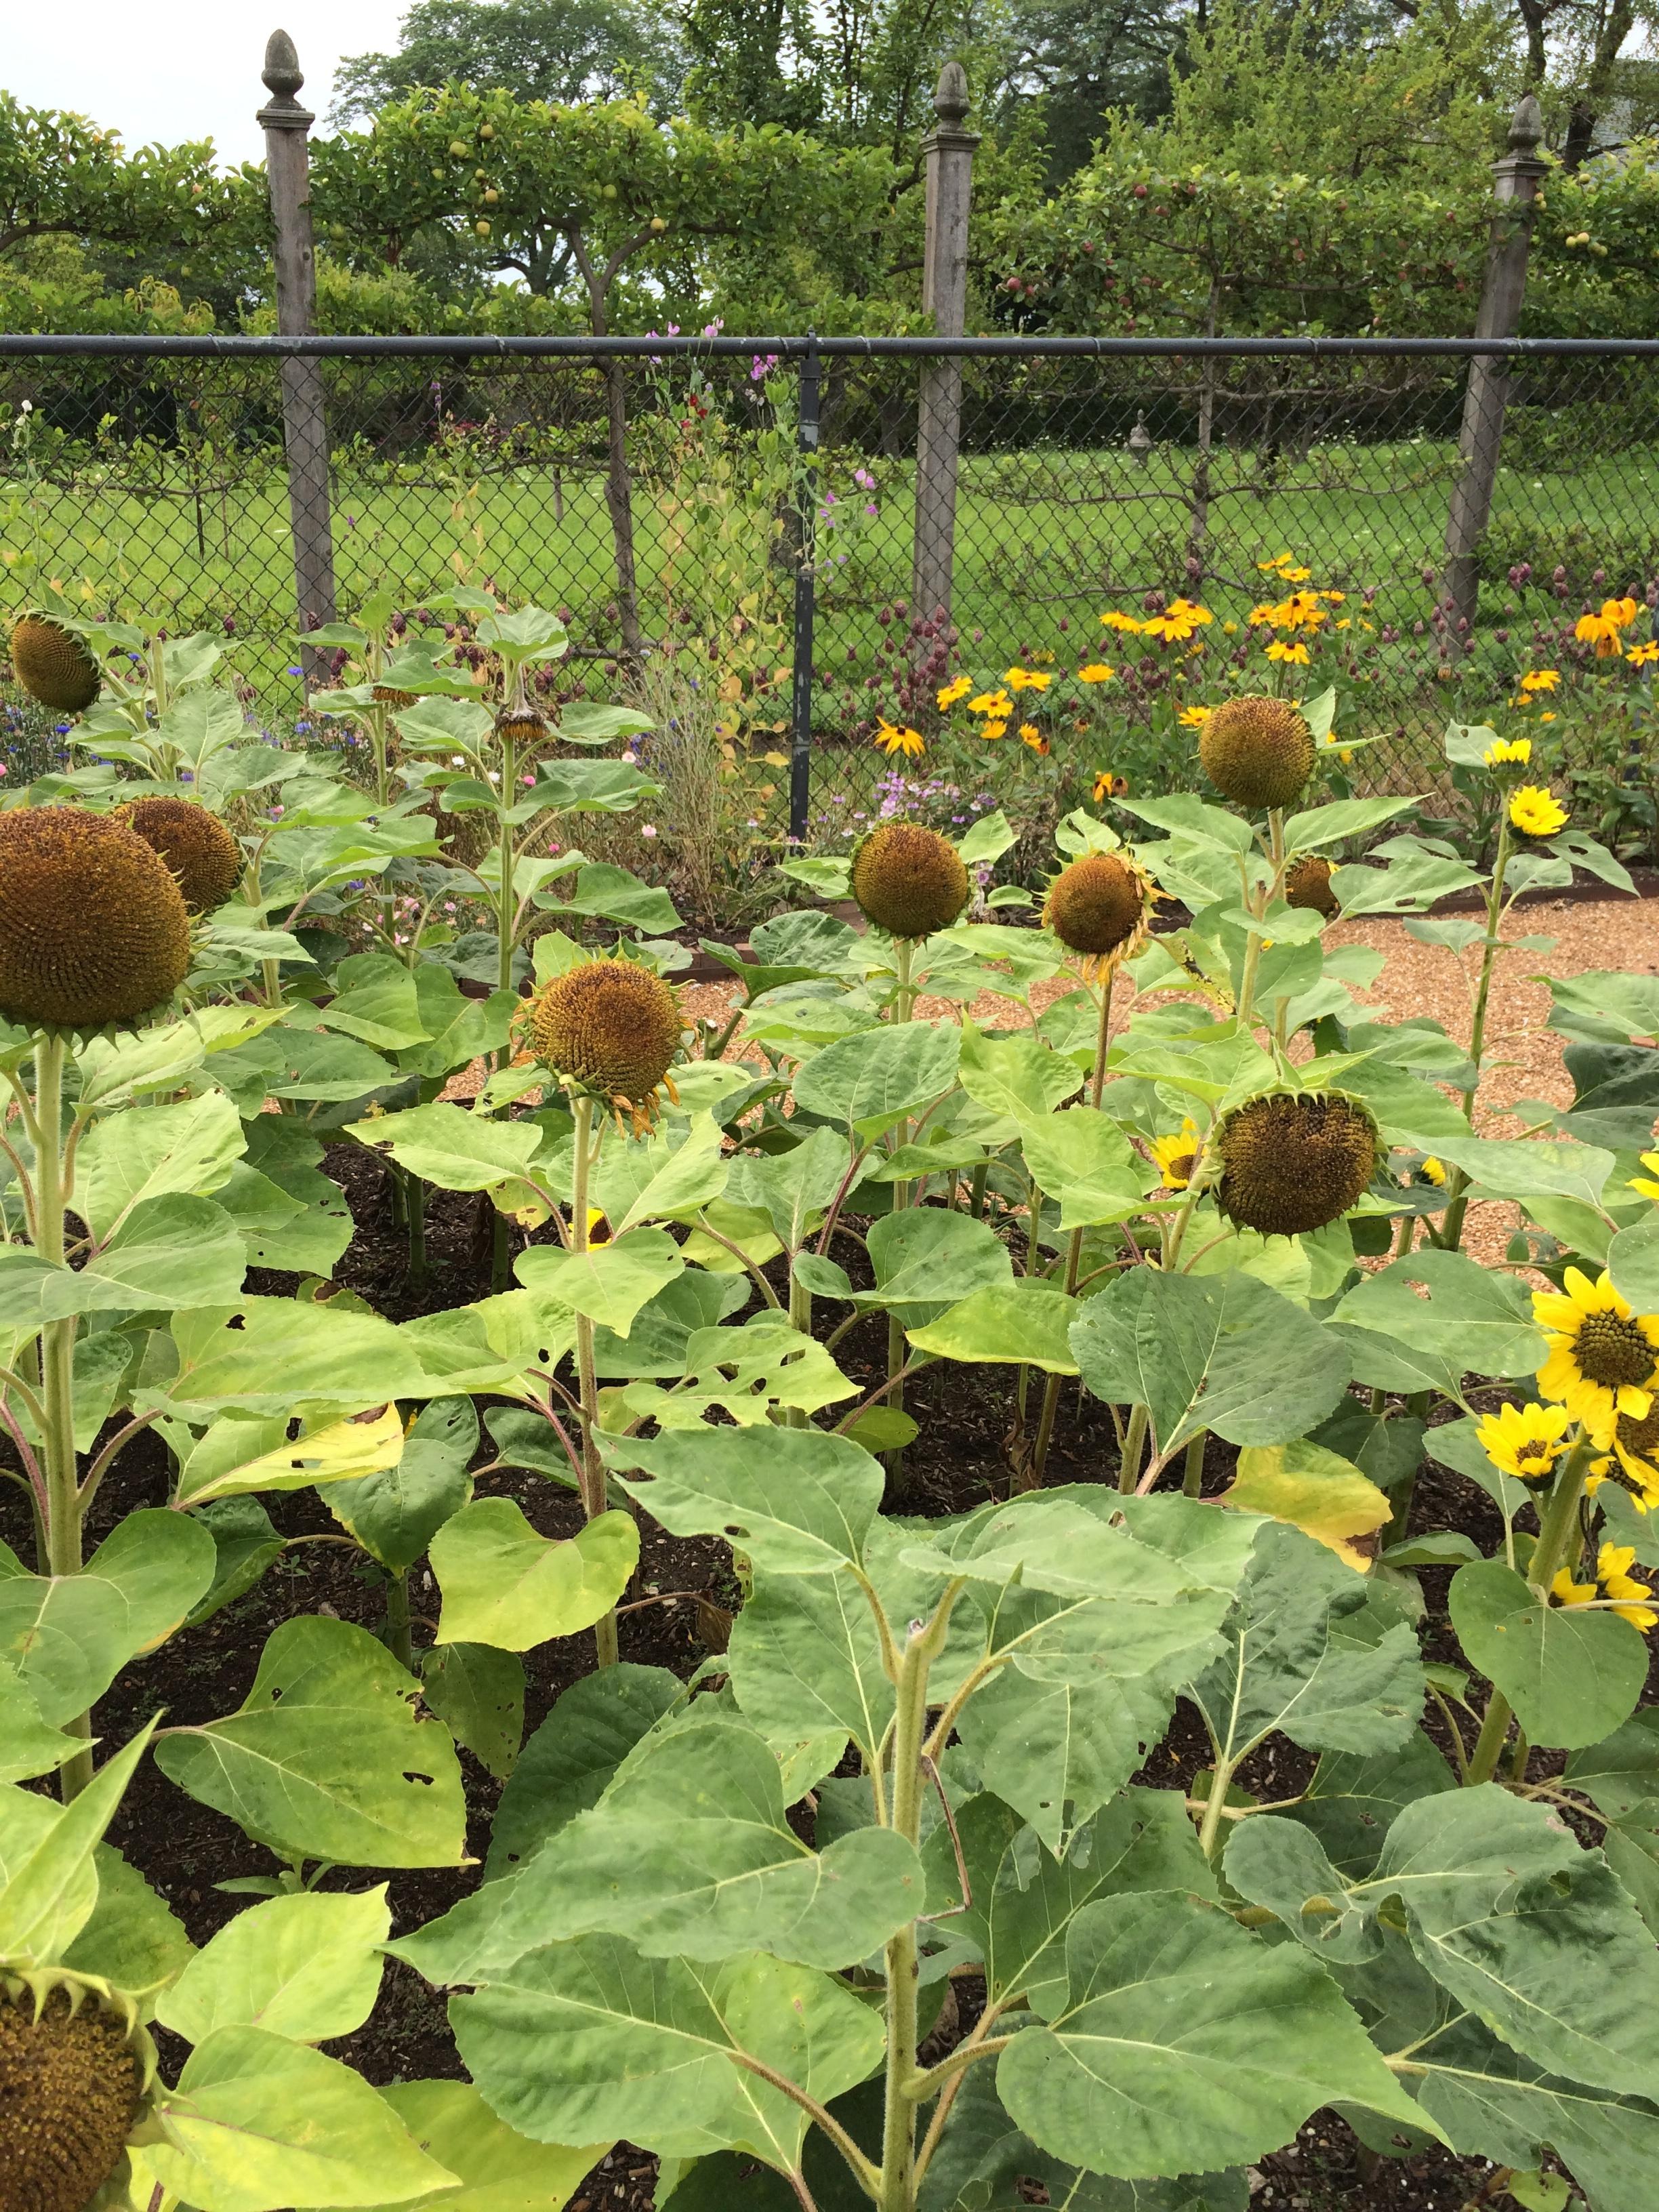 Garden Conservancy Open Days In Illinois Lifeonthecutoff 39 S Blog